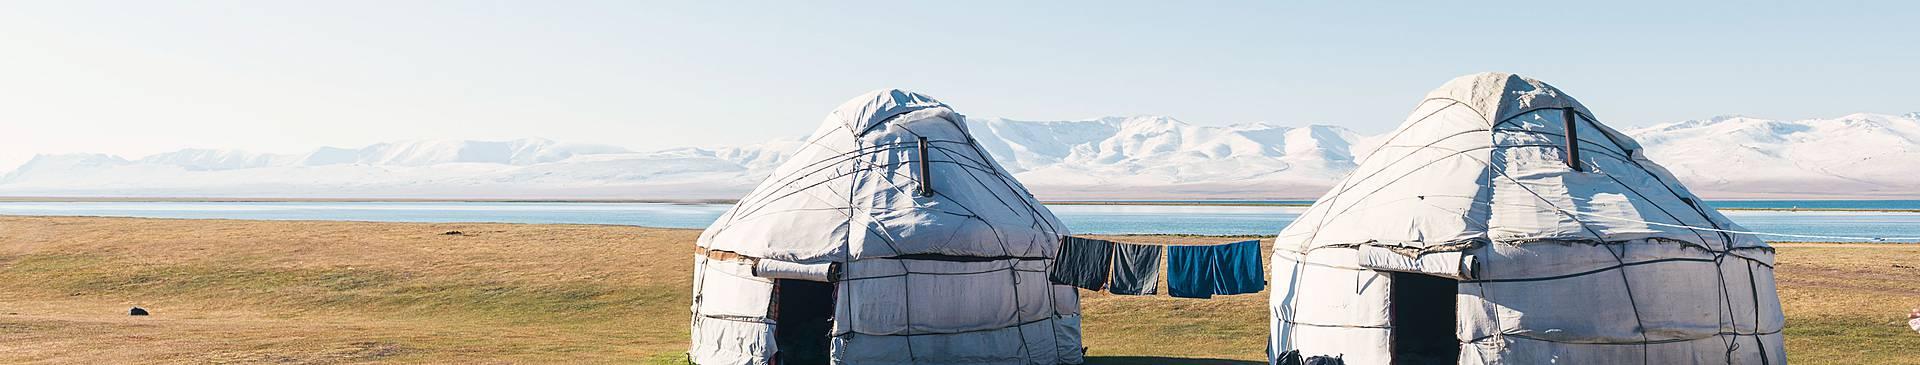 Zwei Wochen nach Kirgistan